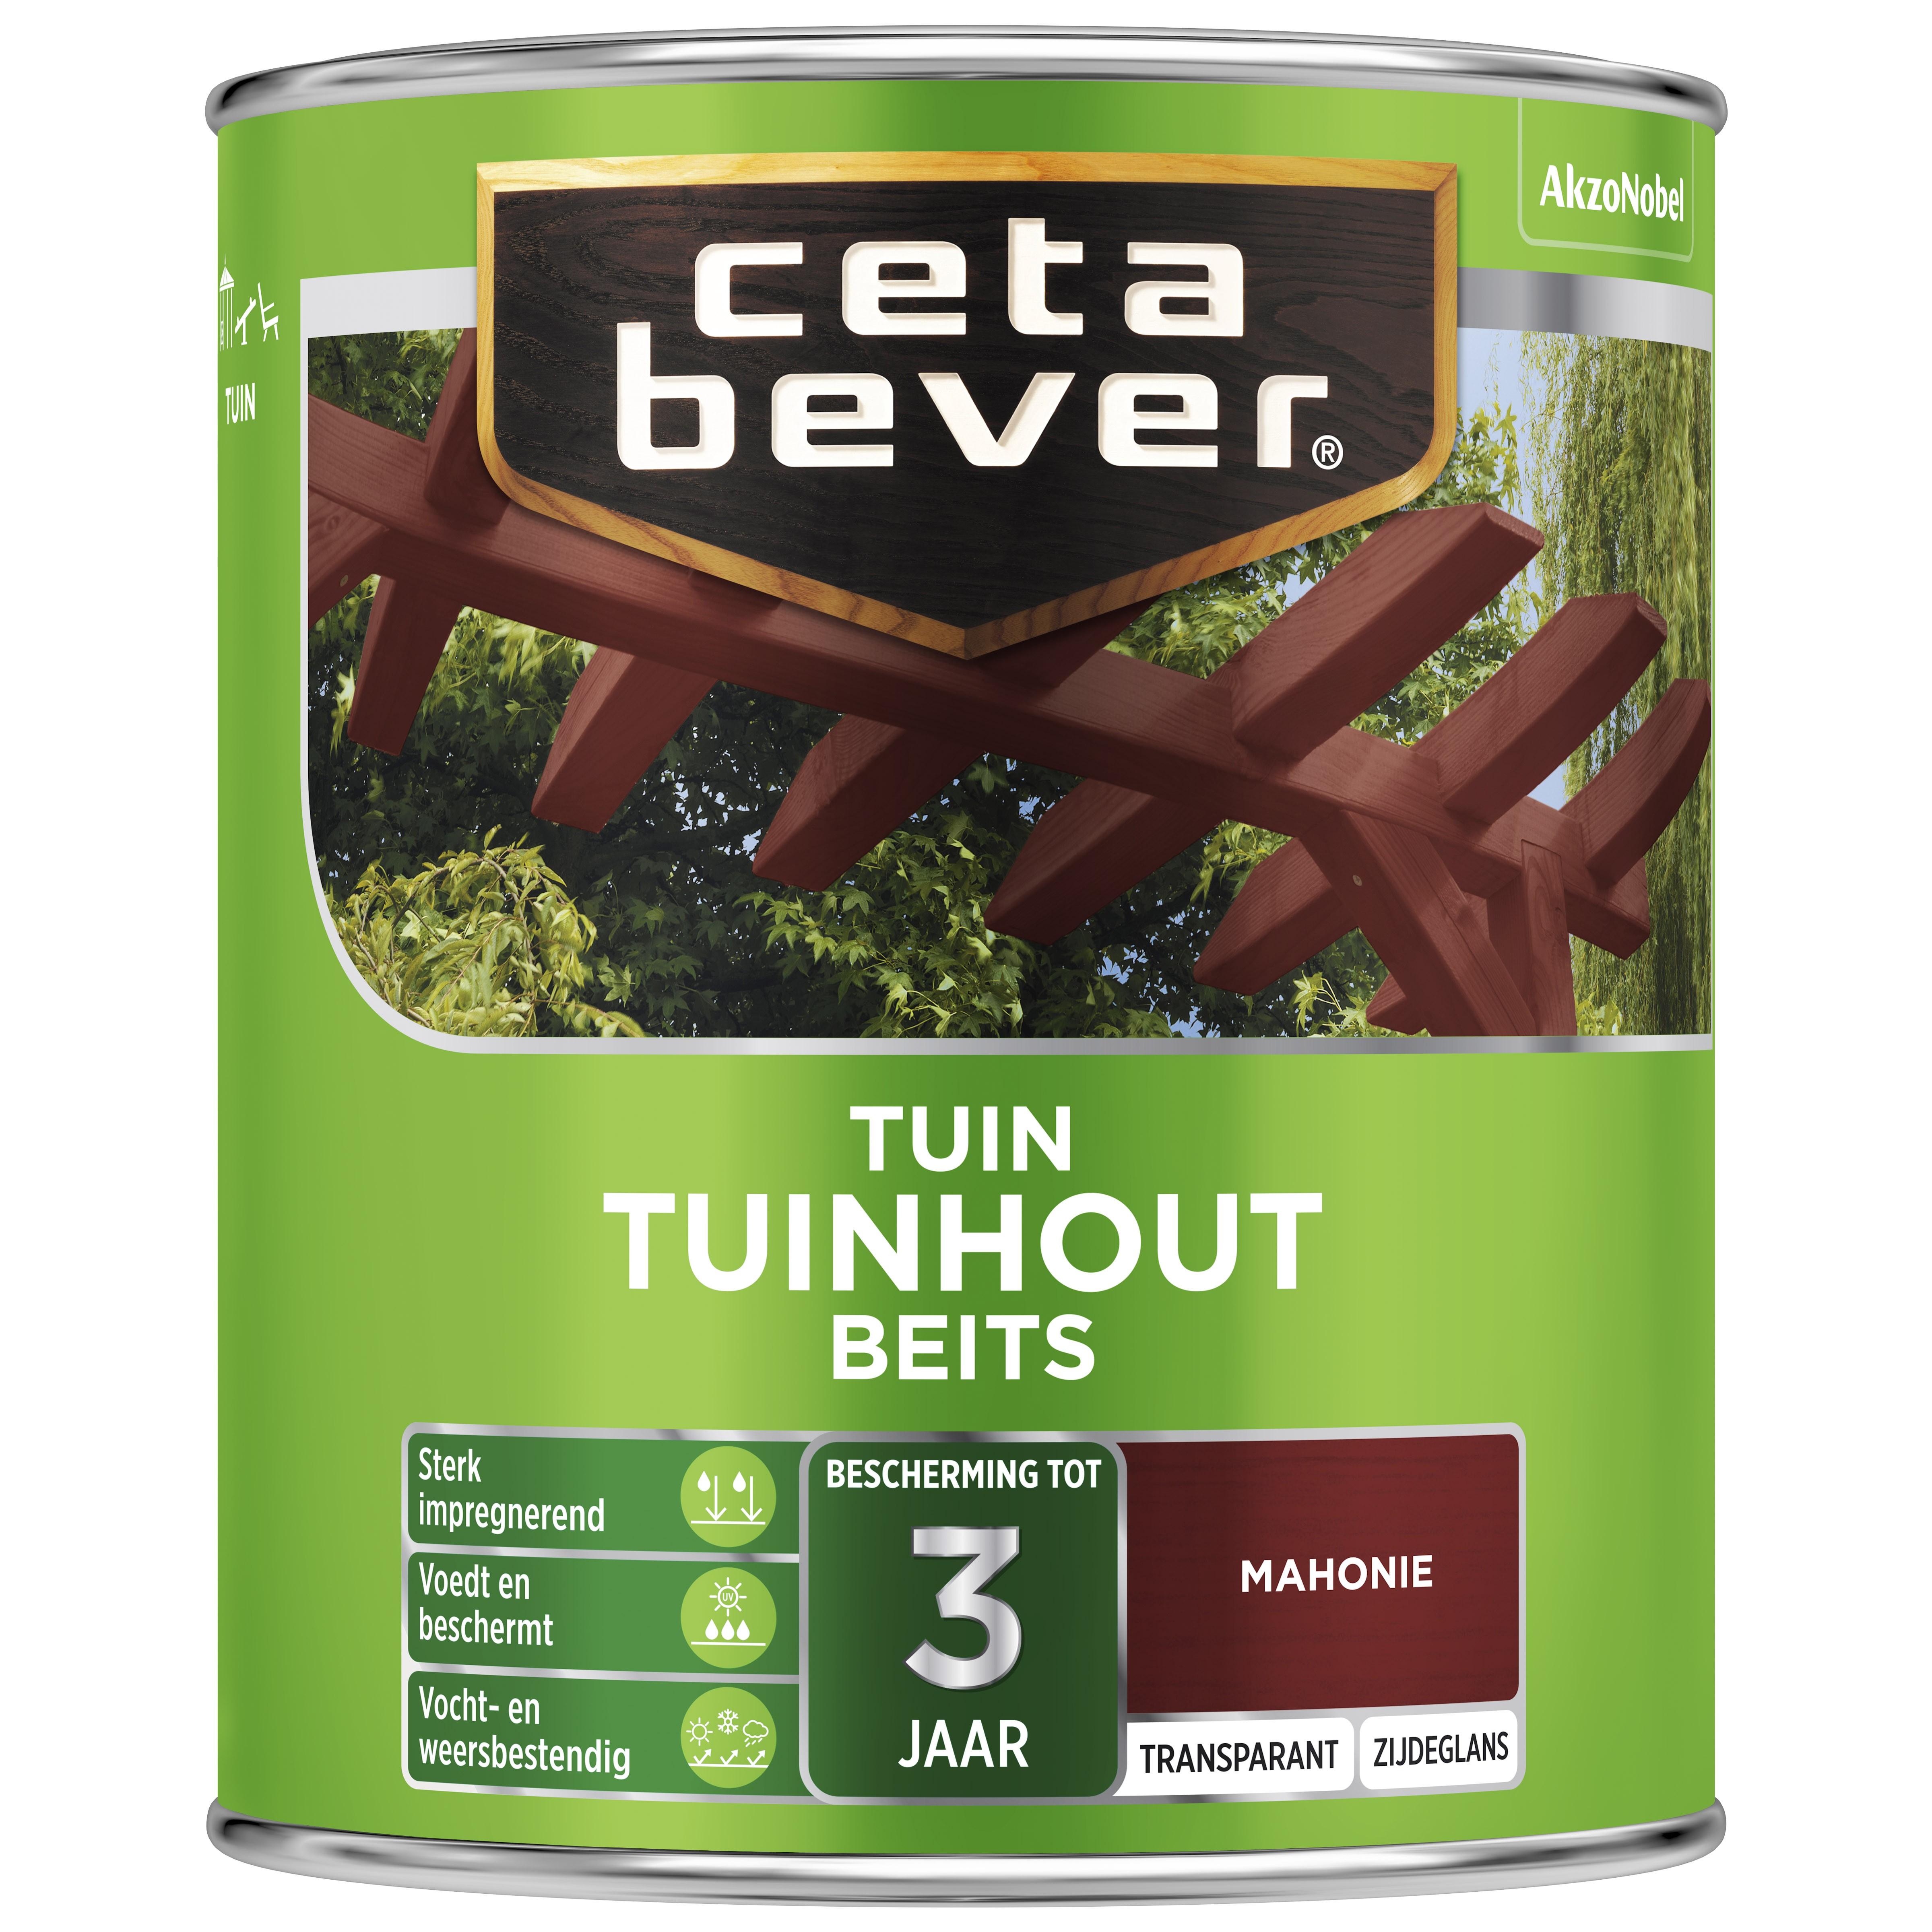 Afbeelding van CetaBever Tuinbeits Transparant 0 75 liter mahonie 045